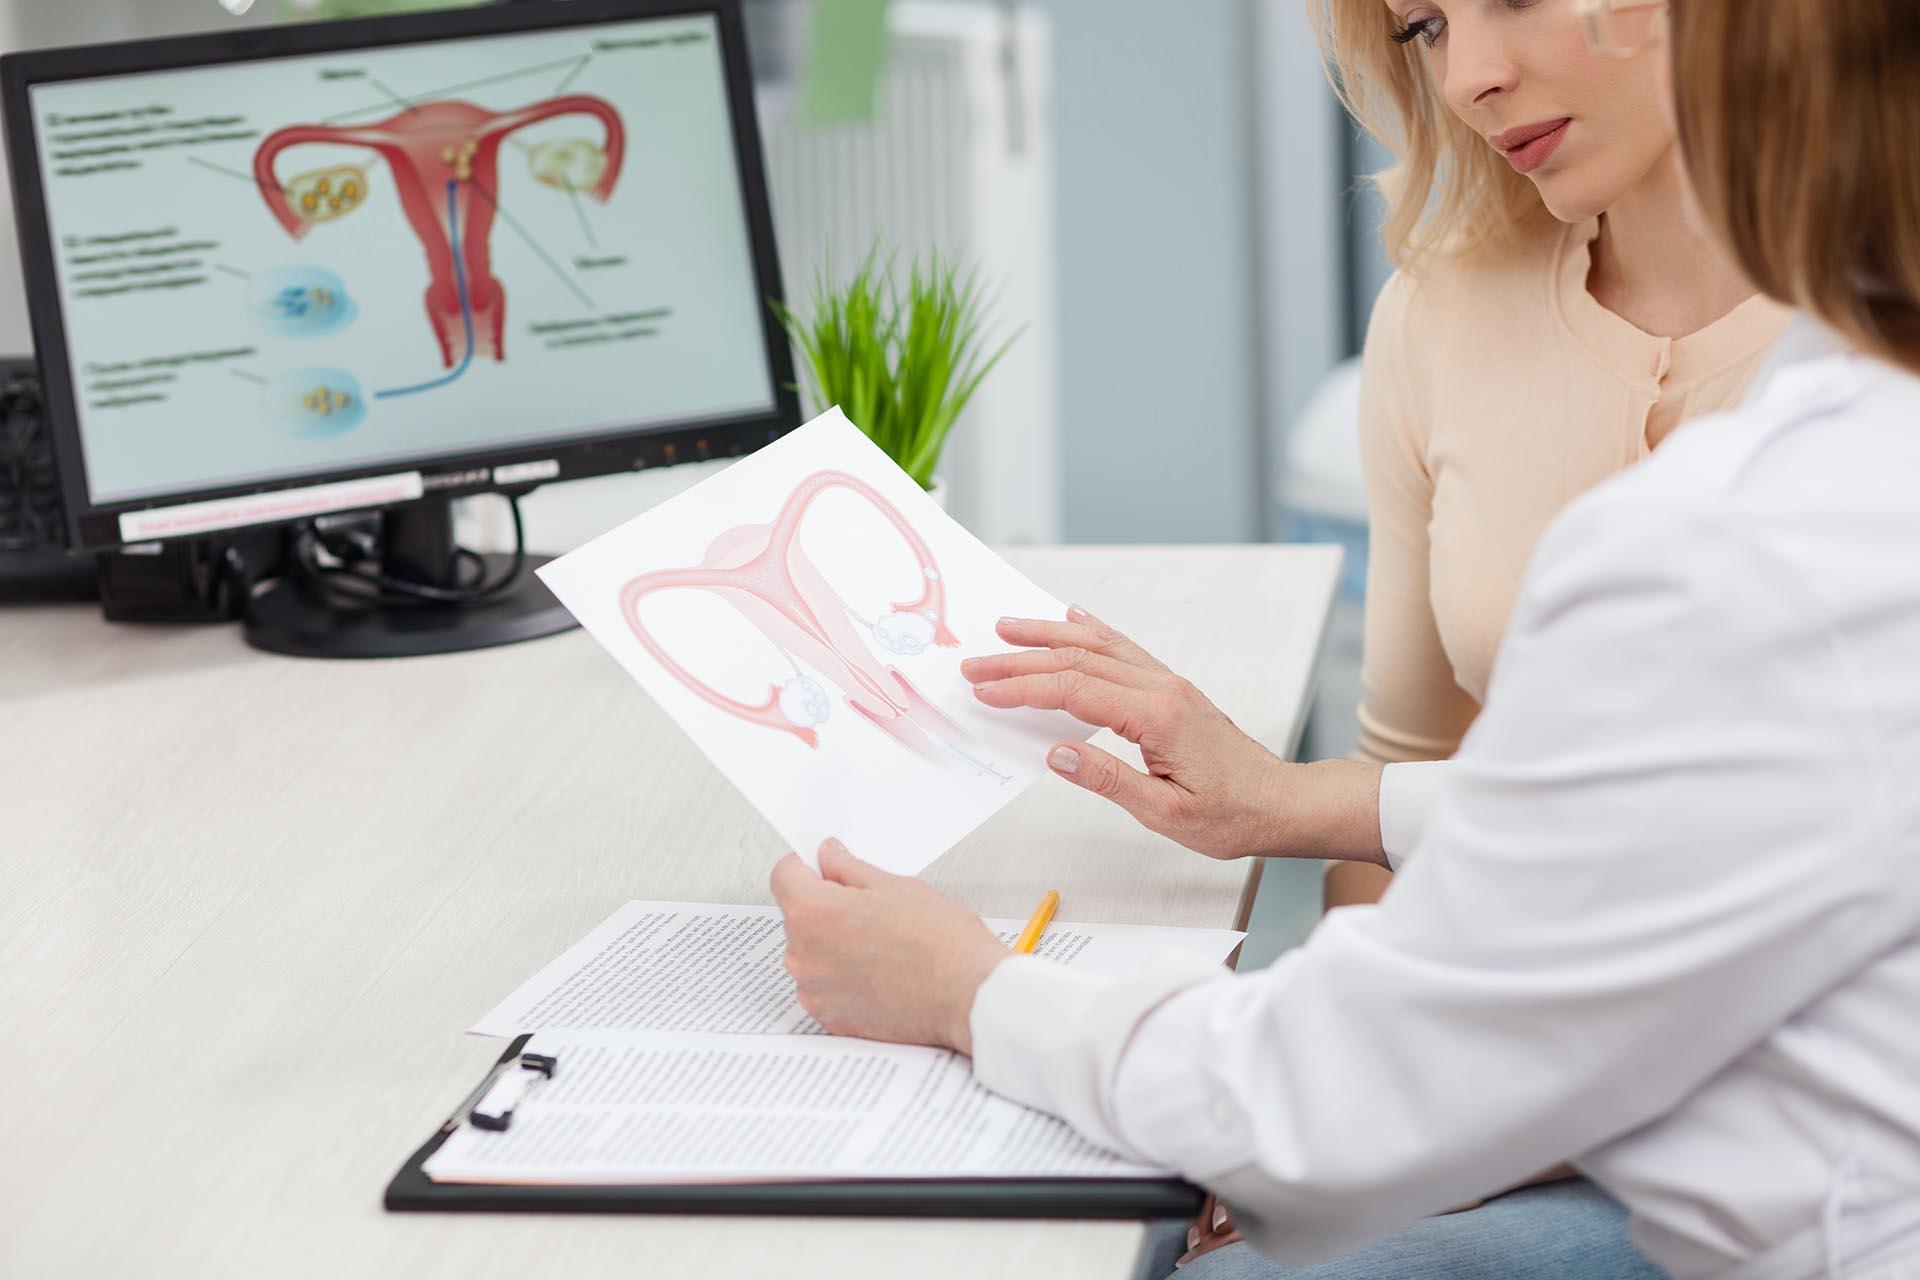 Embarazo tras ligadura de trompas. Ginecología, Mediquo, Tu amigo médico. Chat médico.